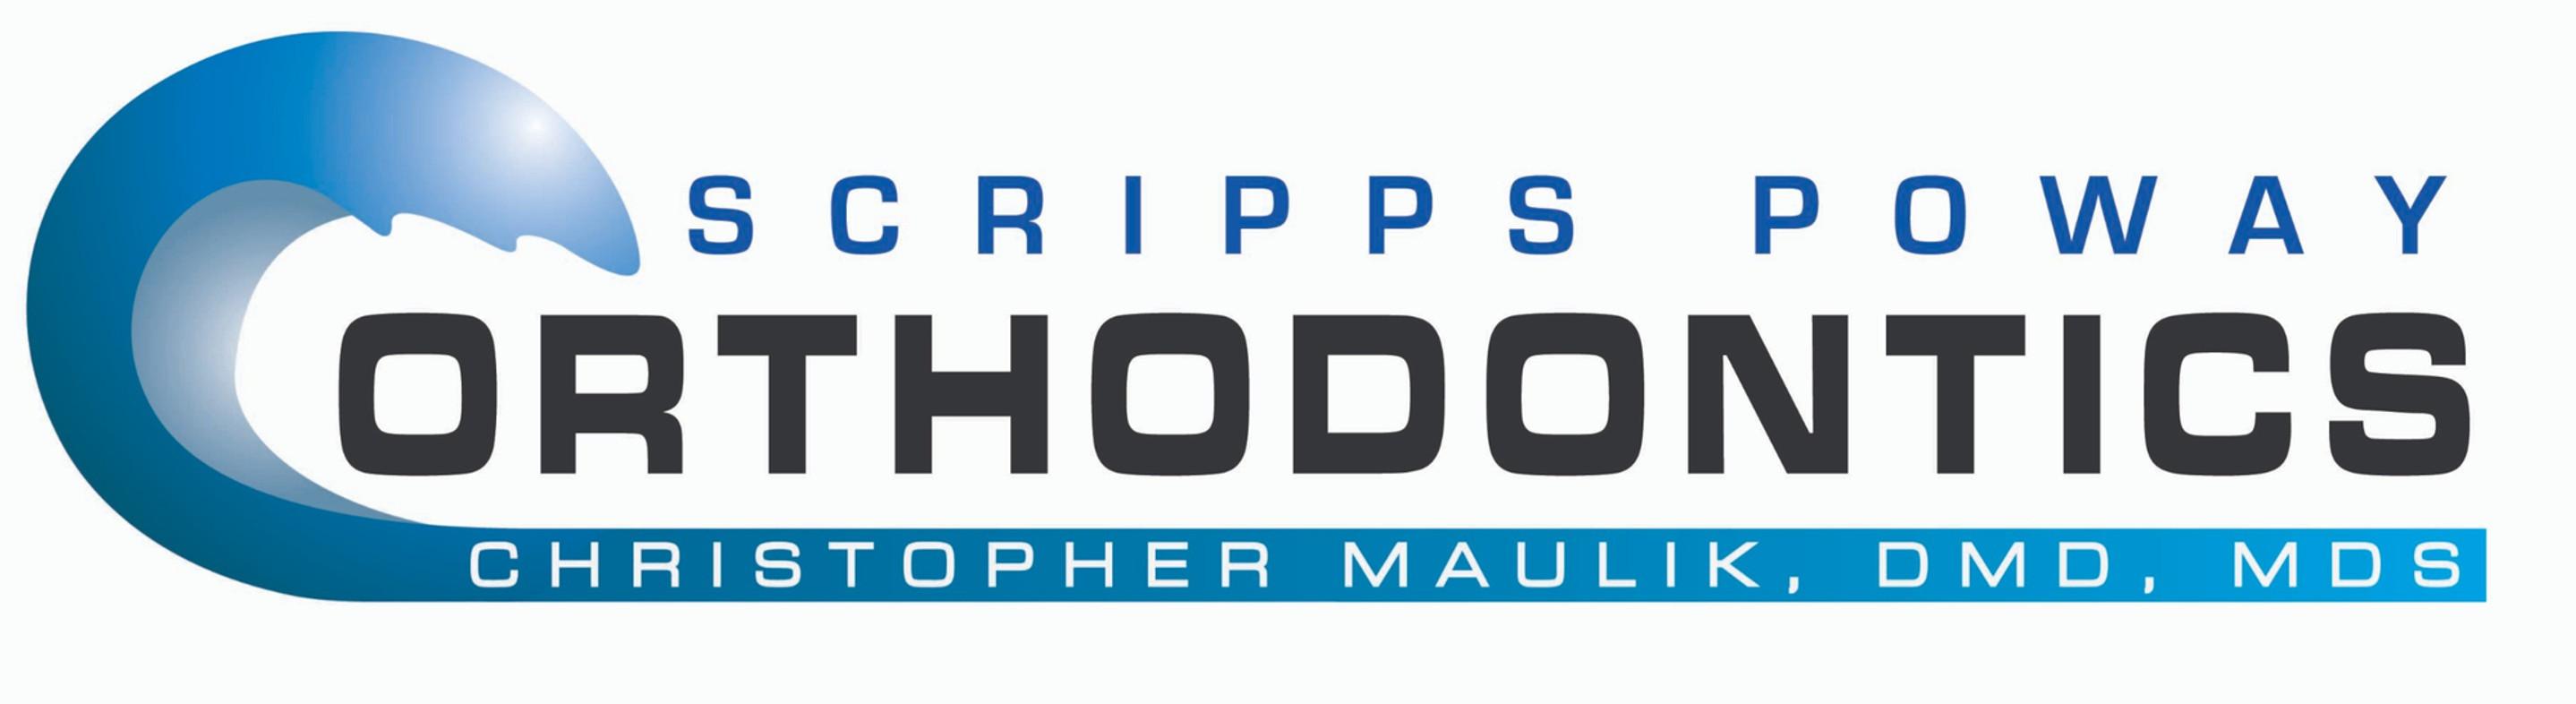 Scripps%20Poway%20Orthodontics%20Maulik_